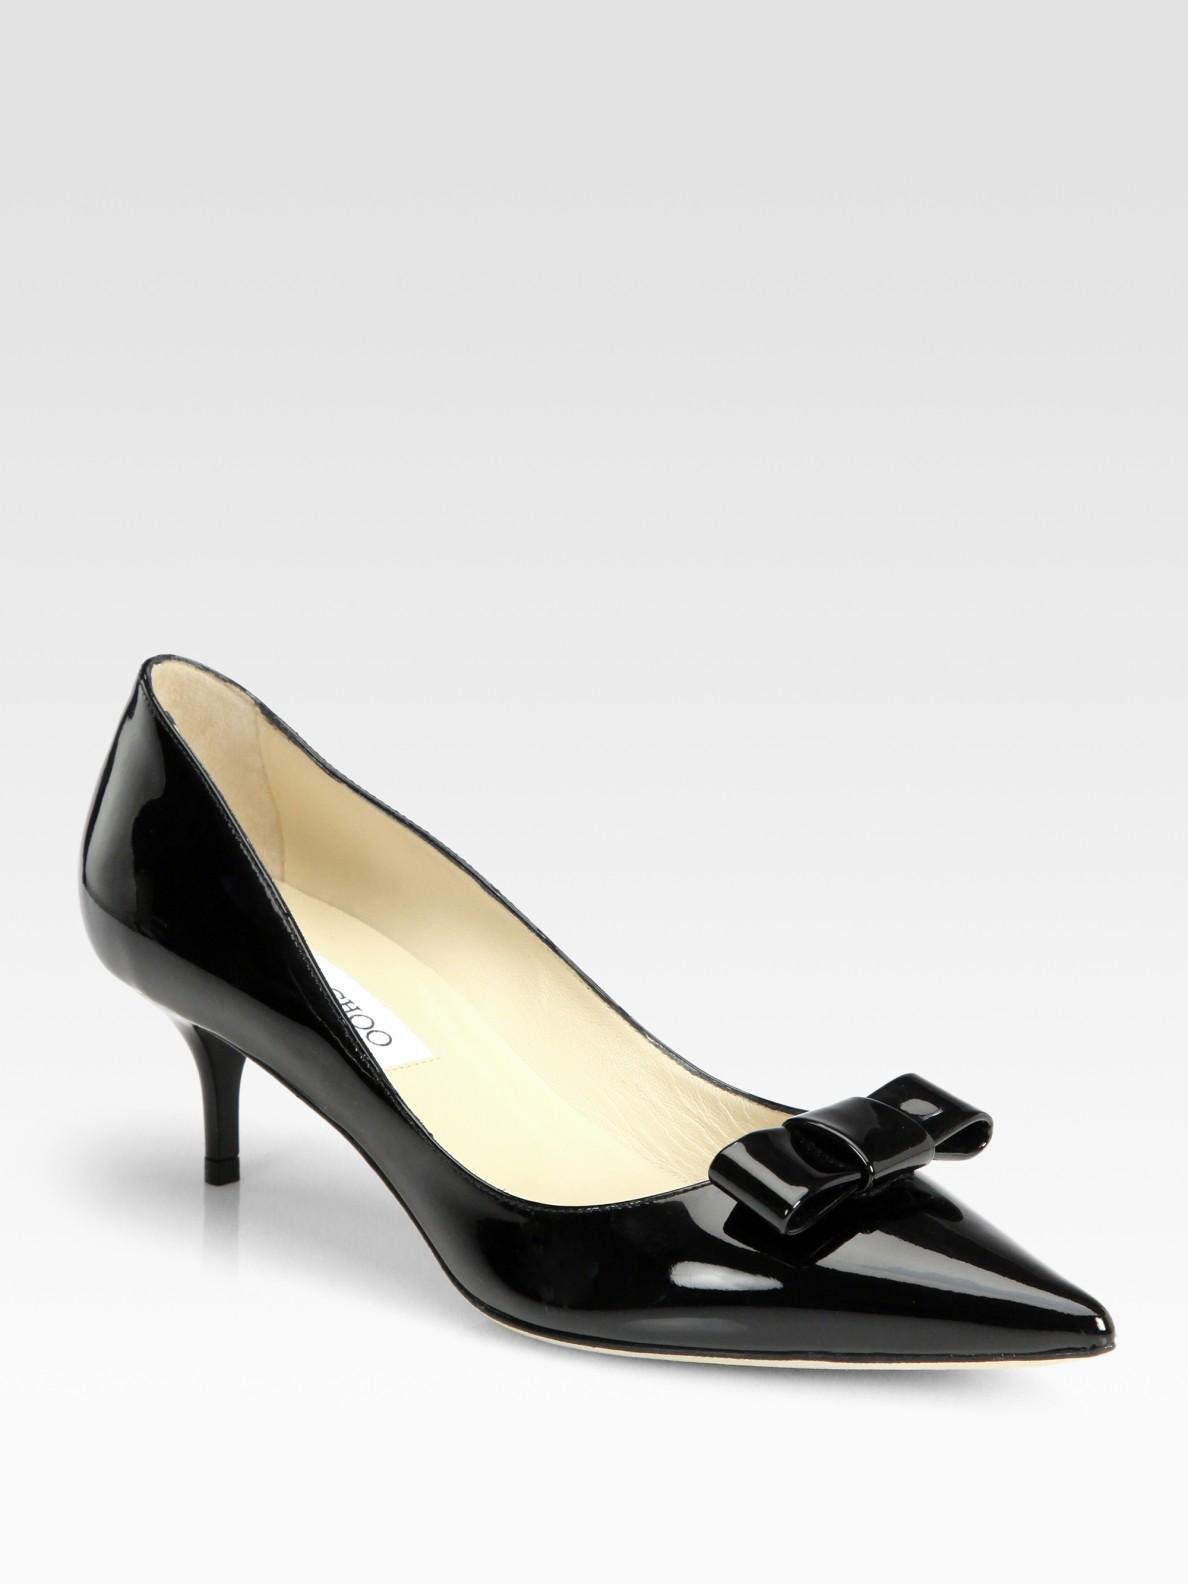 Jimmy Choo Black Patent Shoes